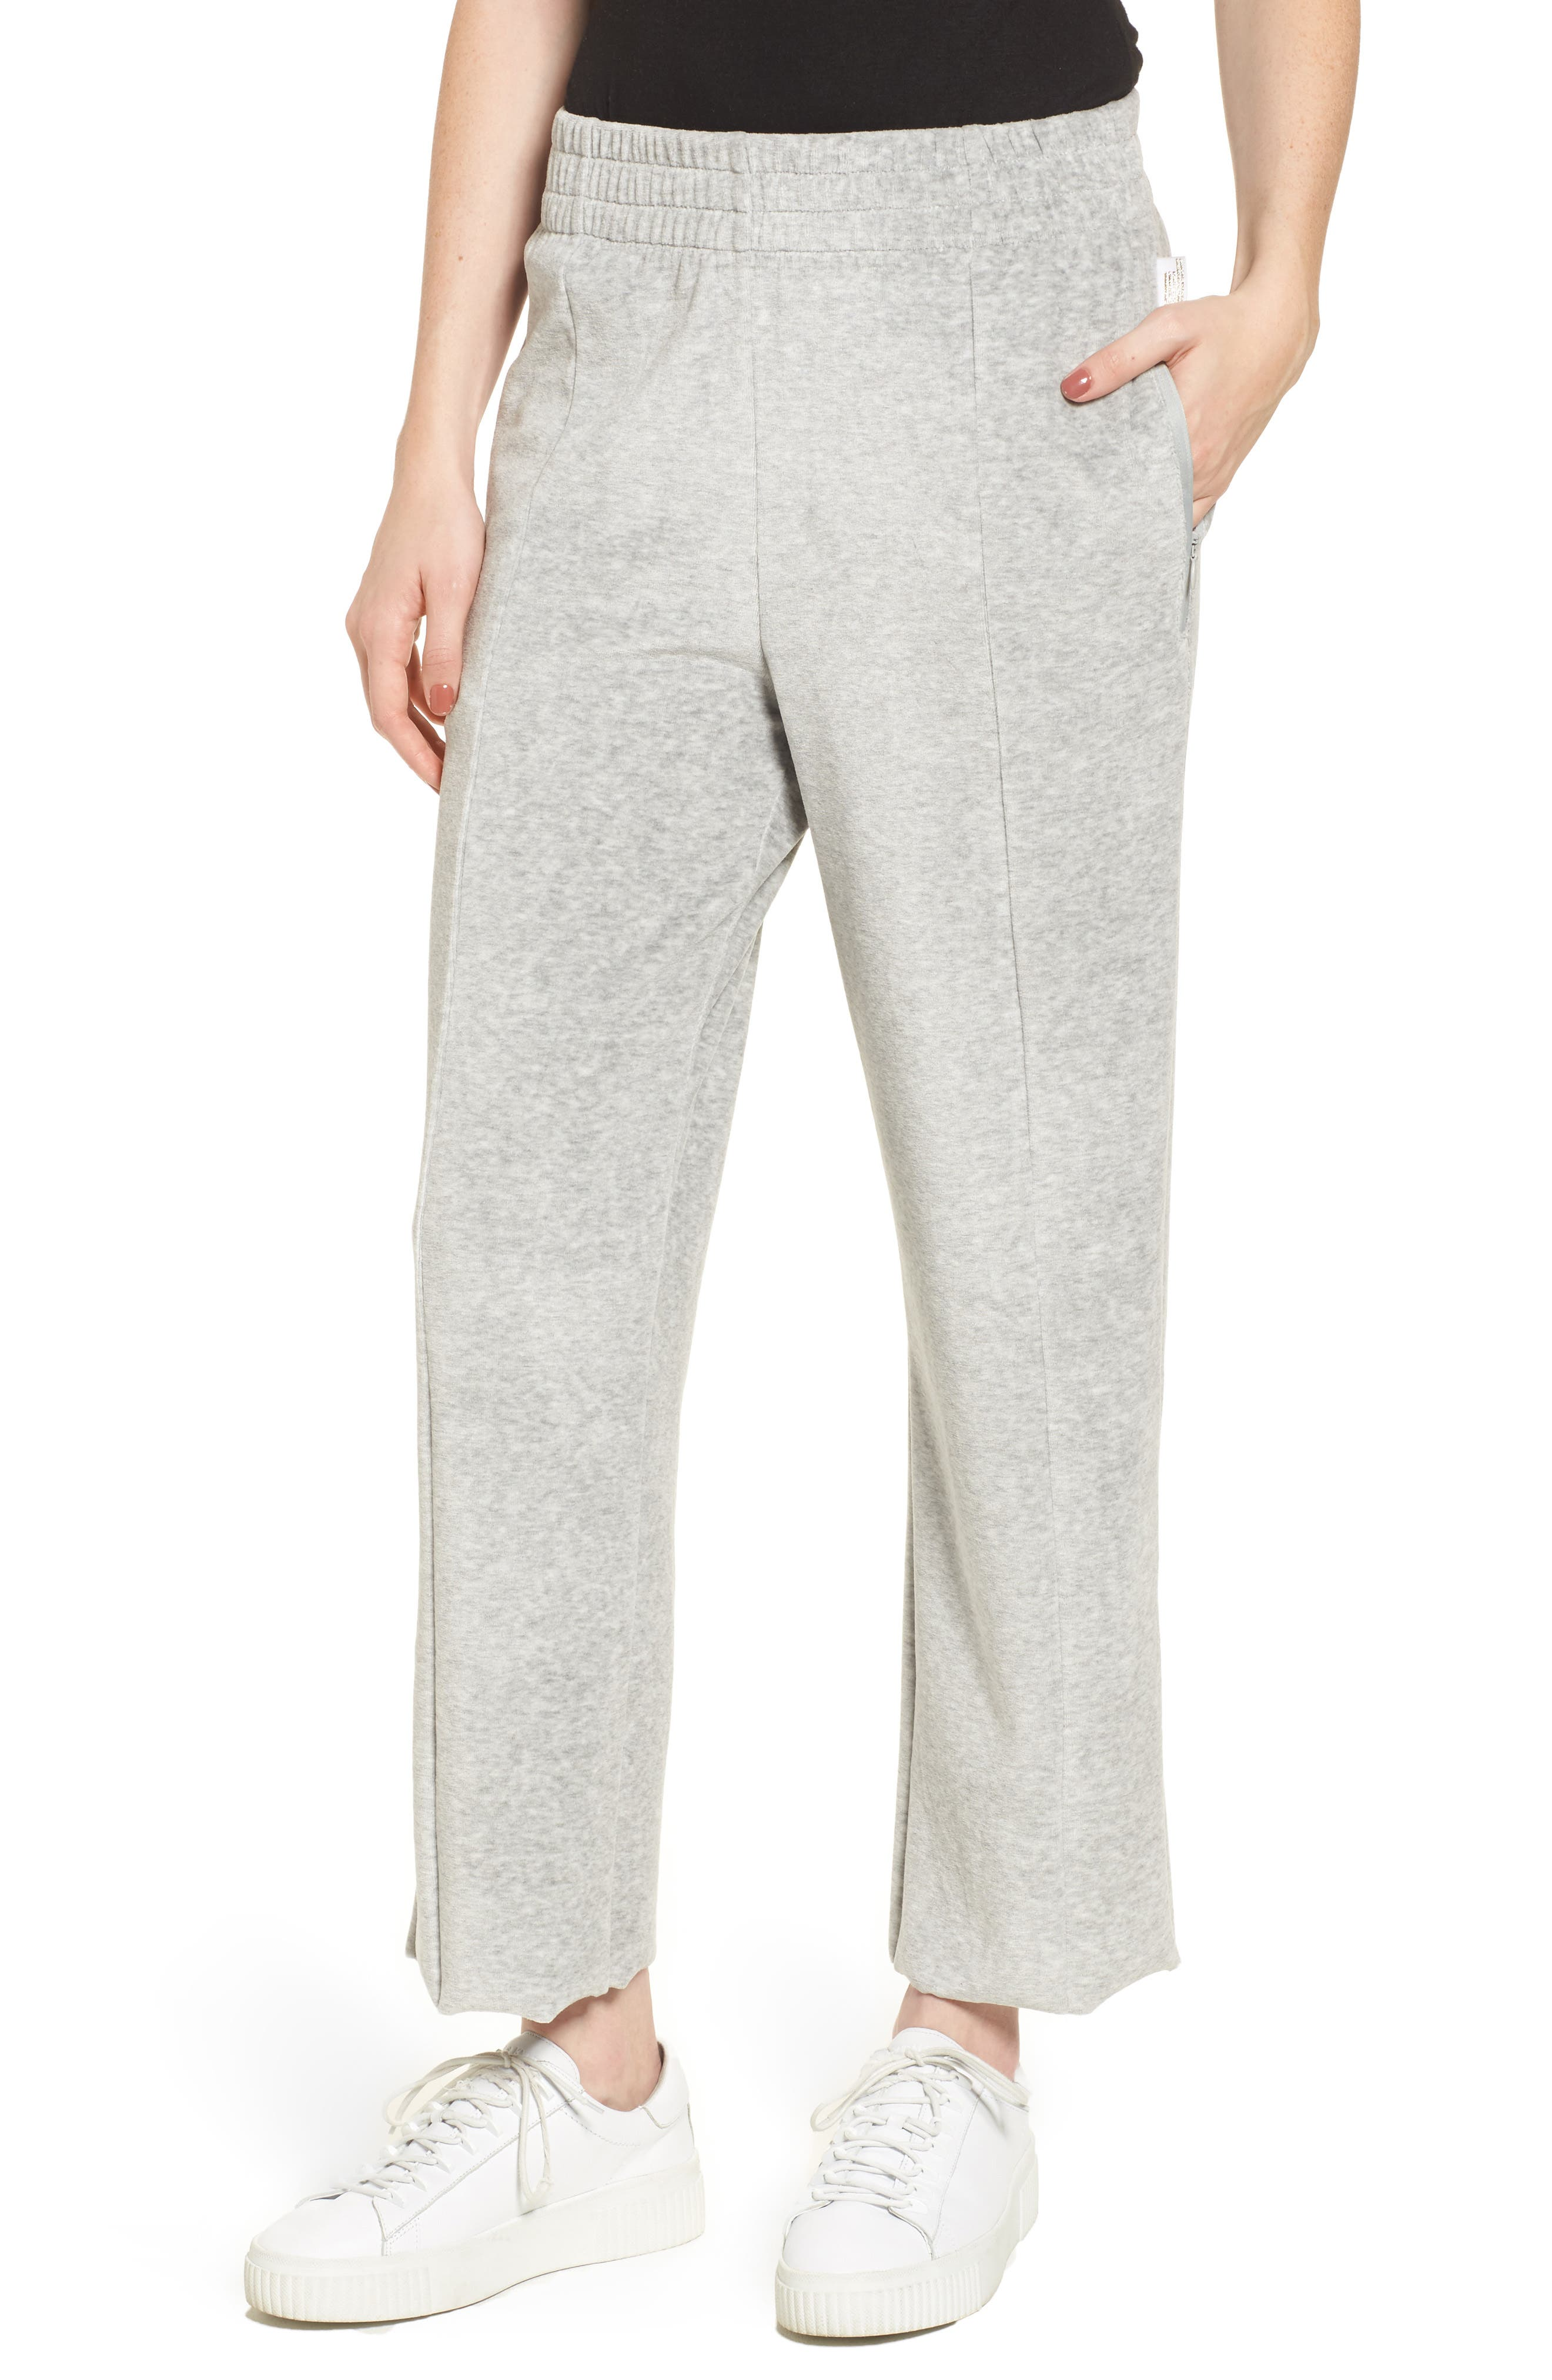 Alternate Image 1 Selected - Good American Good Sweats The High Waist Sweatpants (Regular & Plus Size)